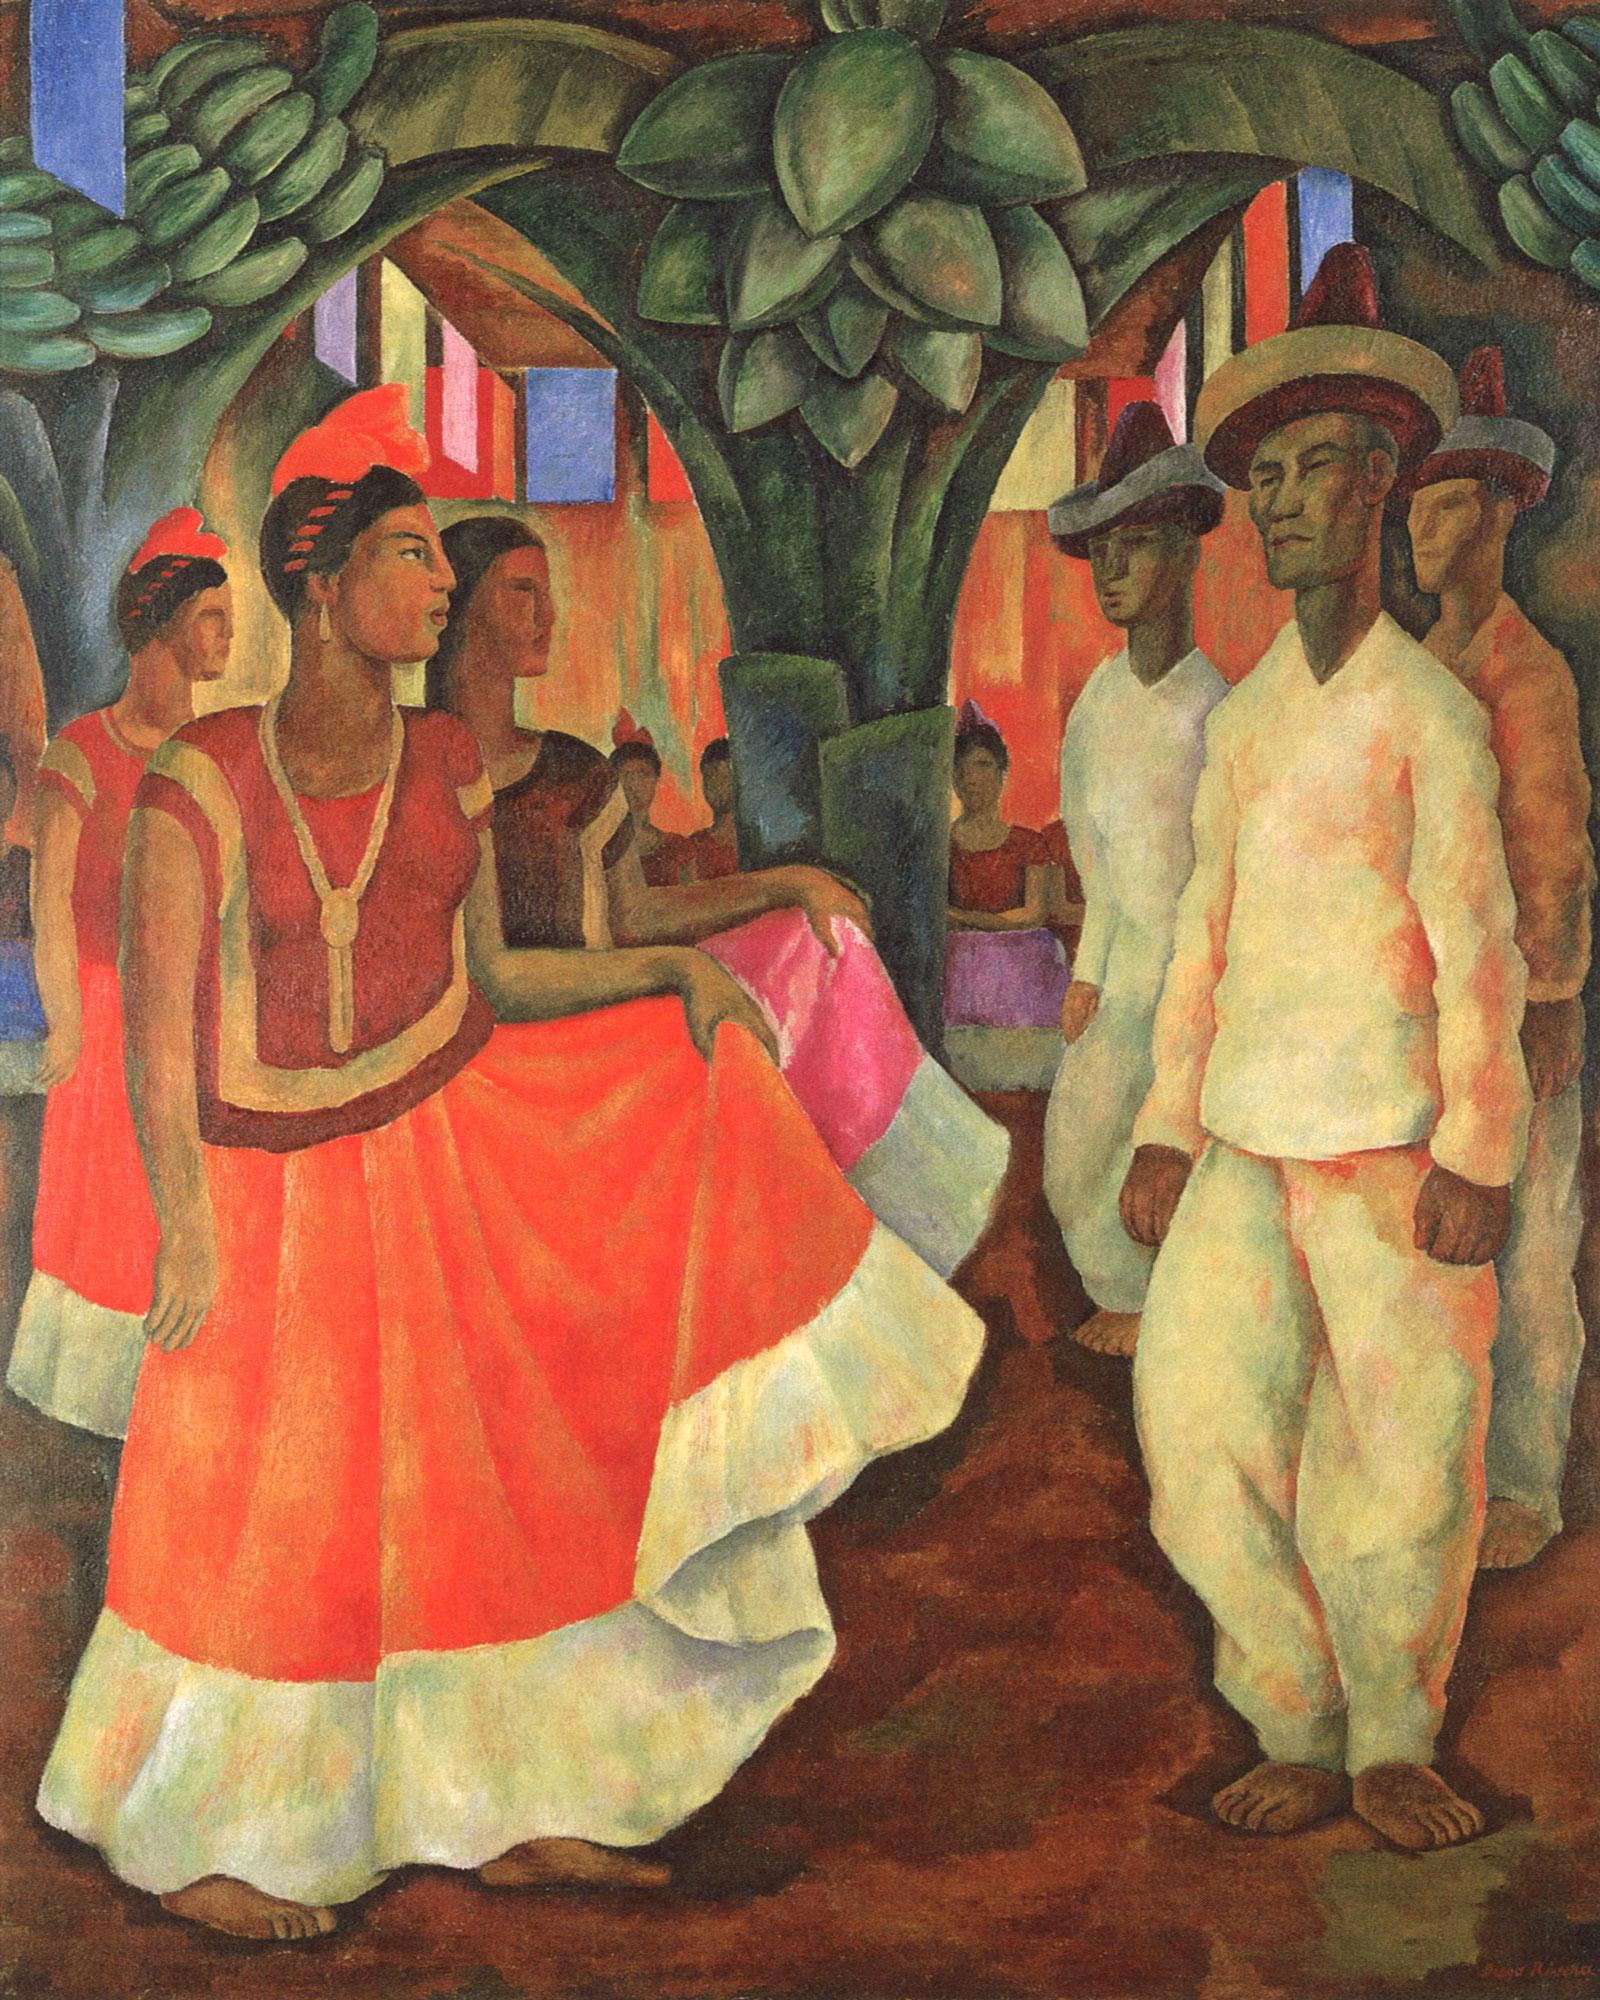 Diego Rivera: Dance in Tehuantepec, 1928